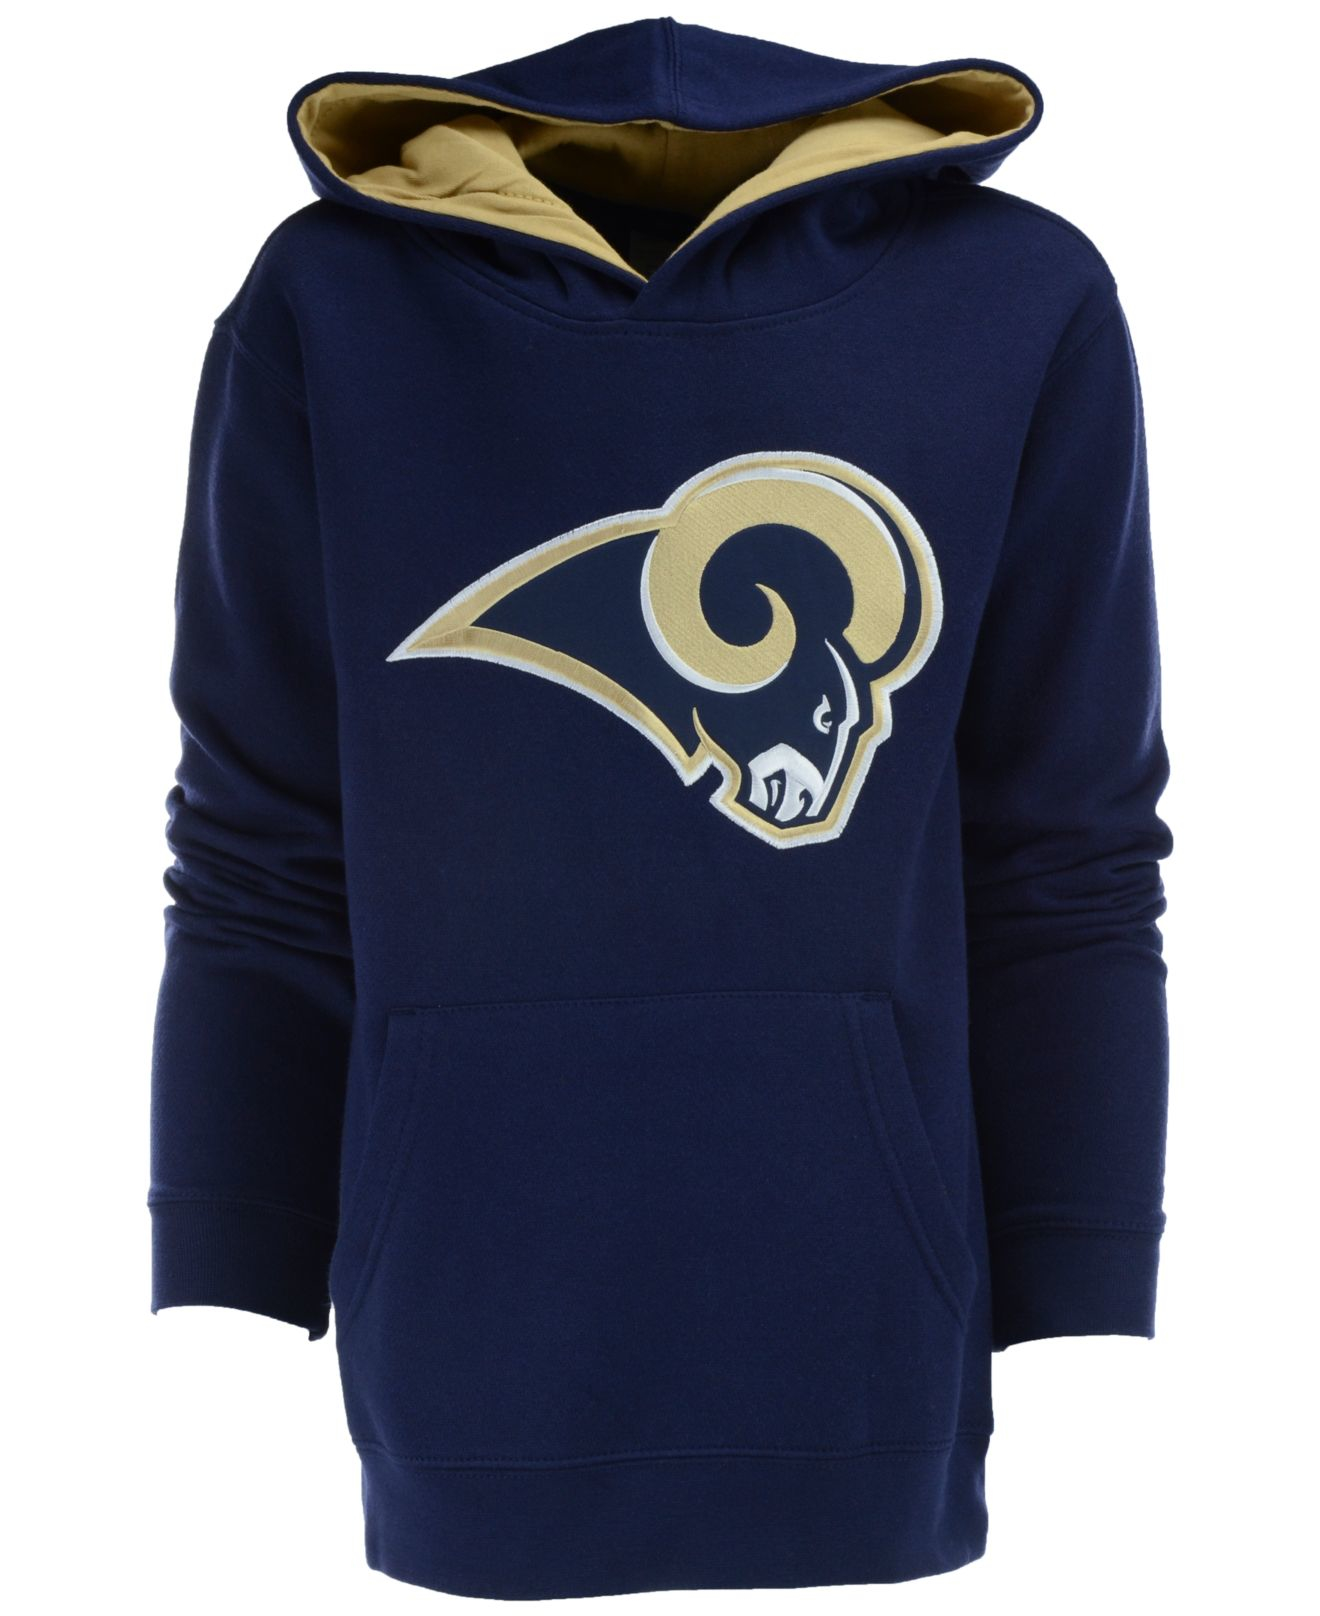 9d6b61c5f905 Lyst - Outerstuff Boys  Los Angeles Rams Sportsman Hoodie in Blue ...